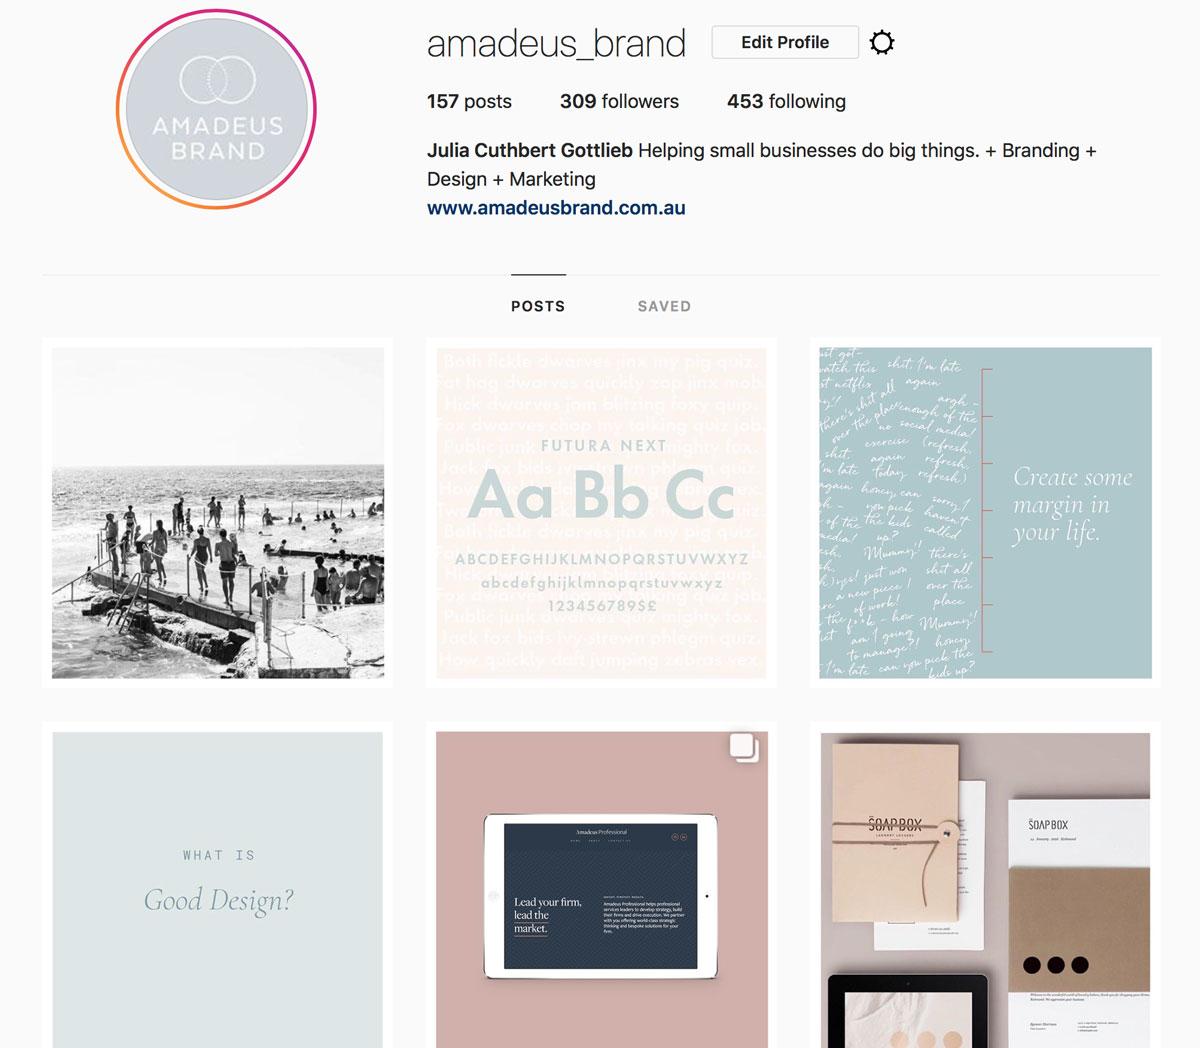 Amadeus Brand  on Instagram